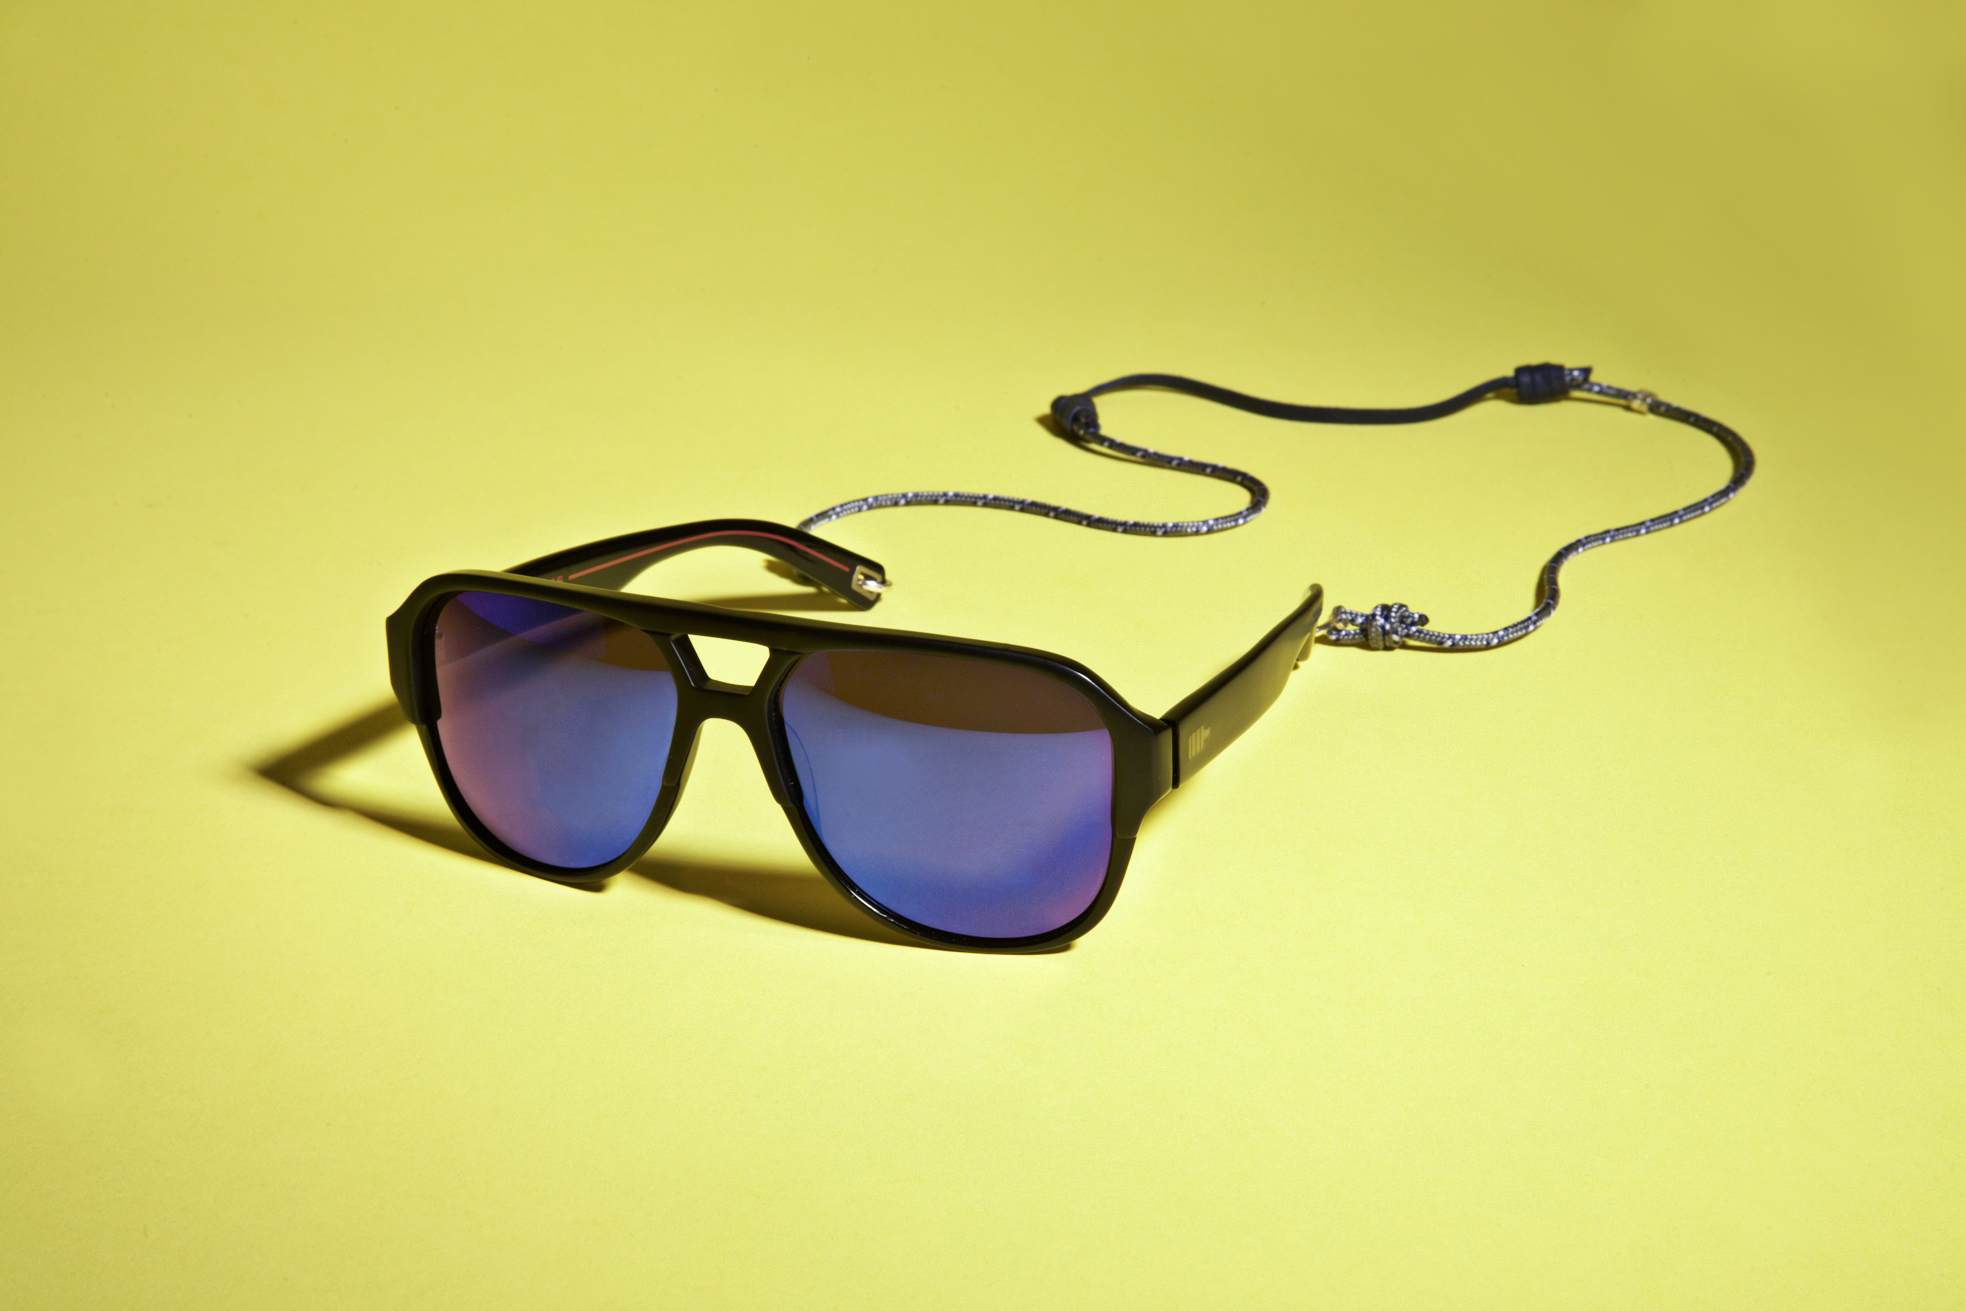 1_Mosley_Tribes_Barneys_Product_photography_sunglasses.jpg